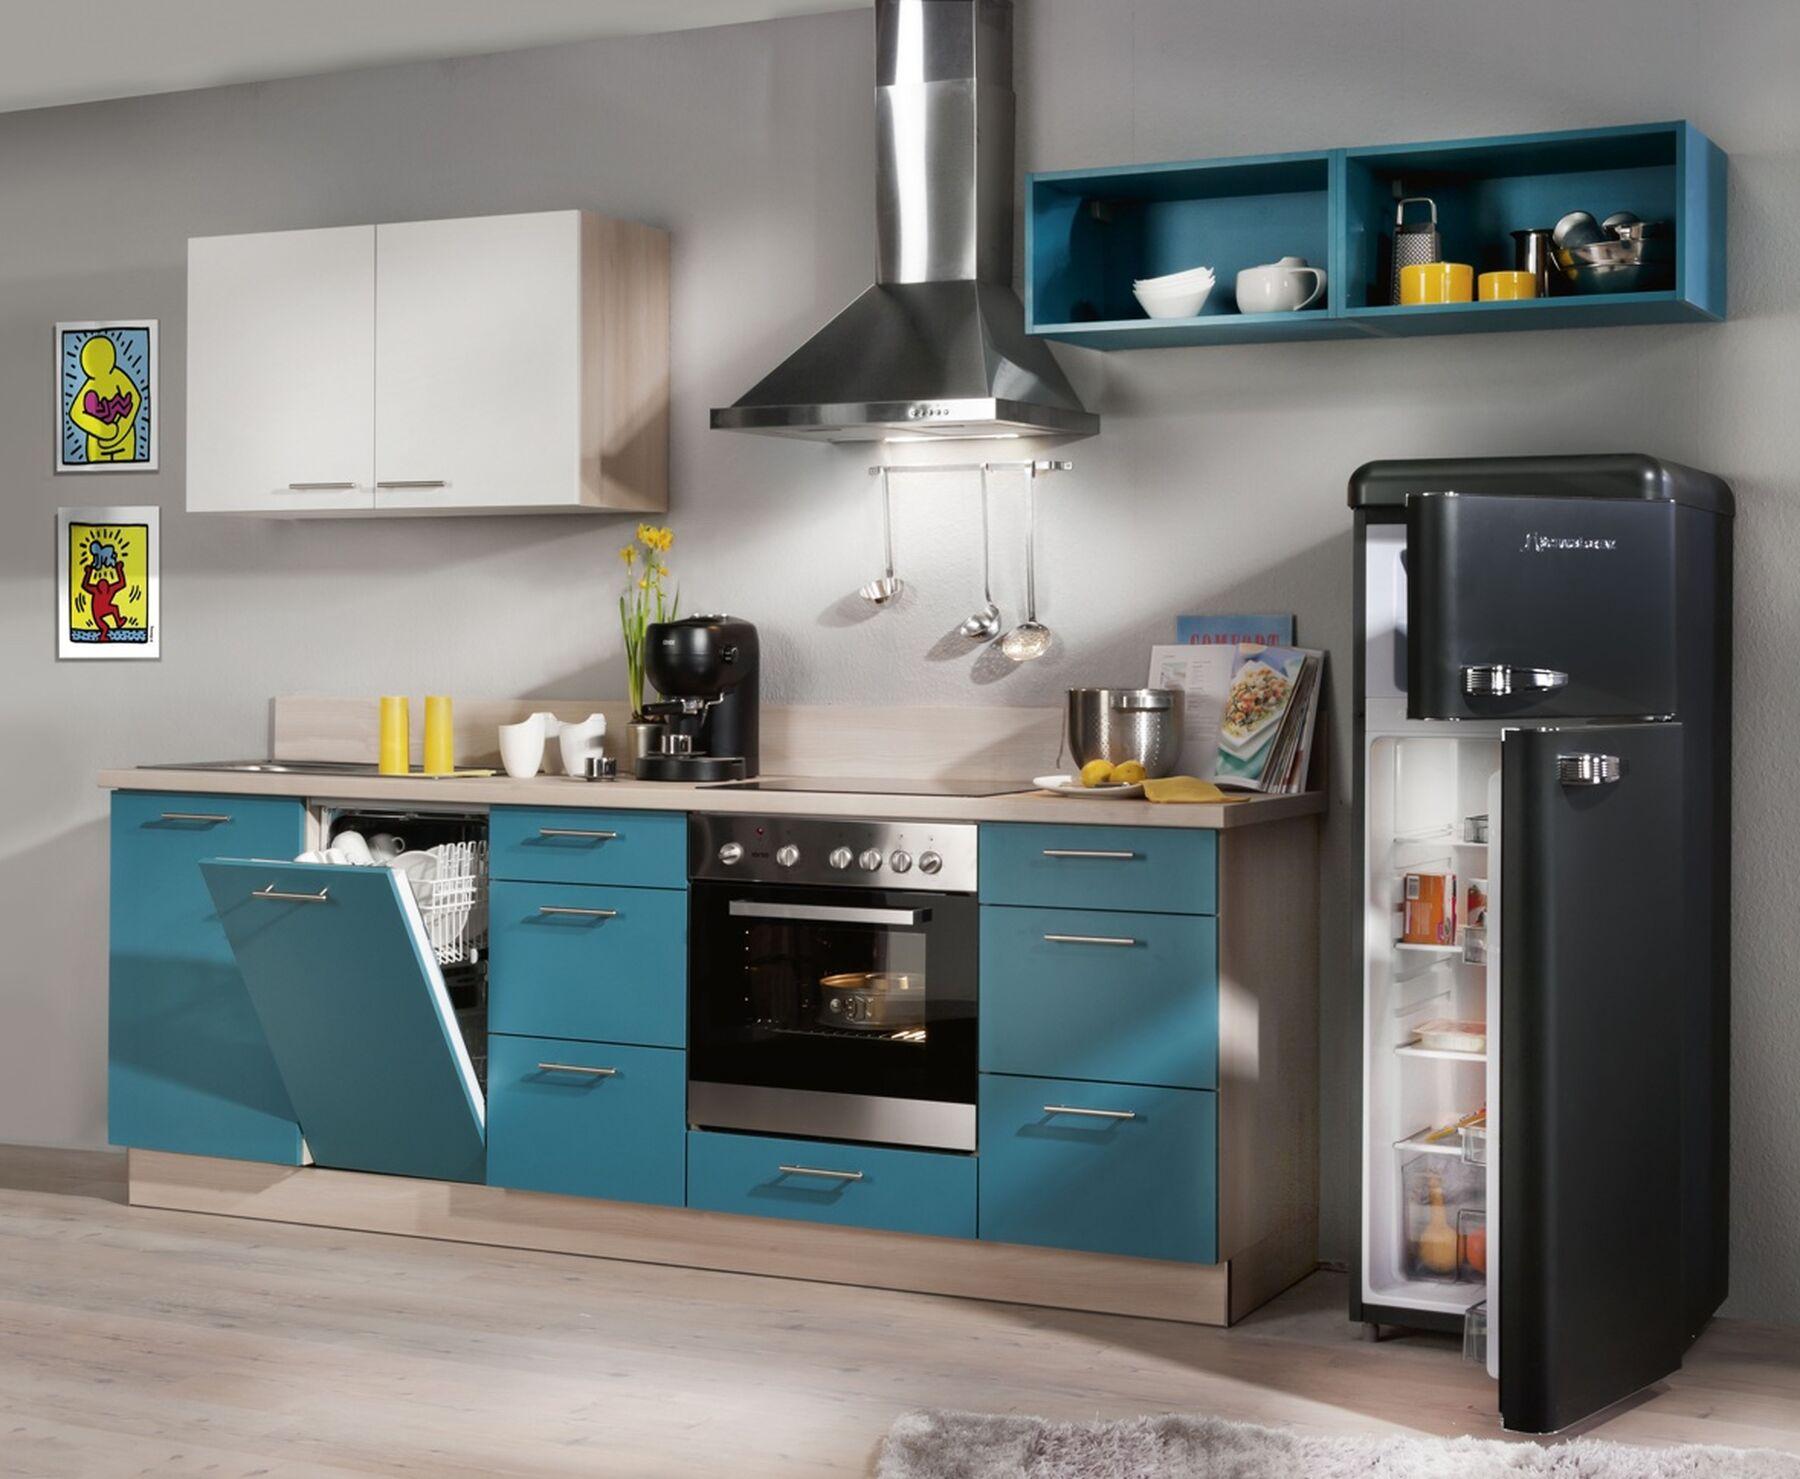 Mini Kühlschrank Möbelix : Elektro geräte service zubehör möbelix küchen online shop